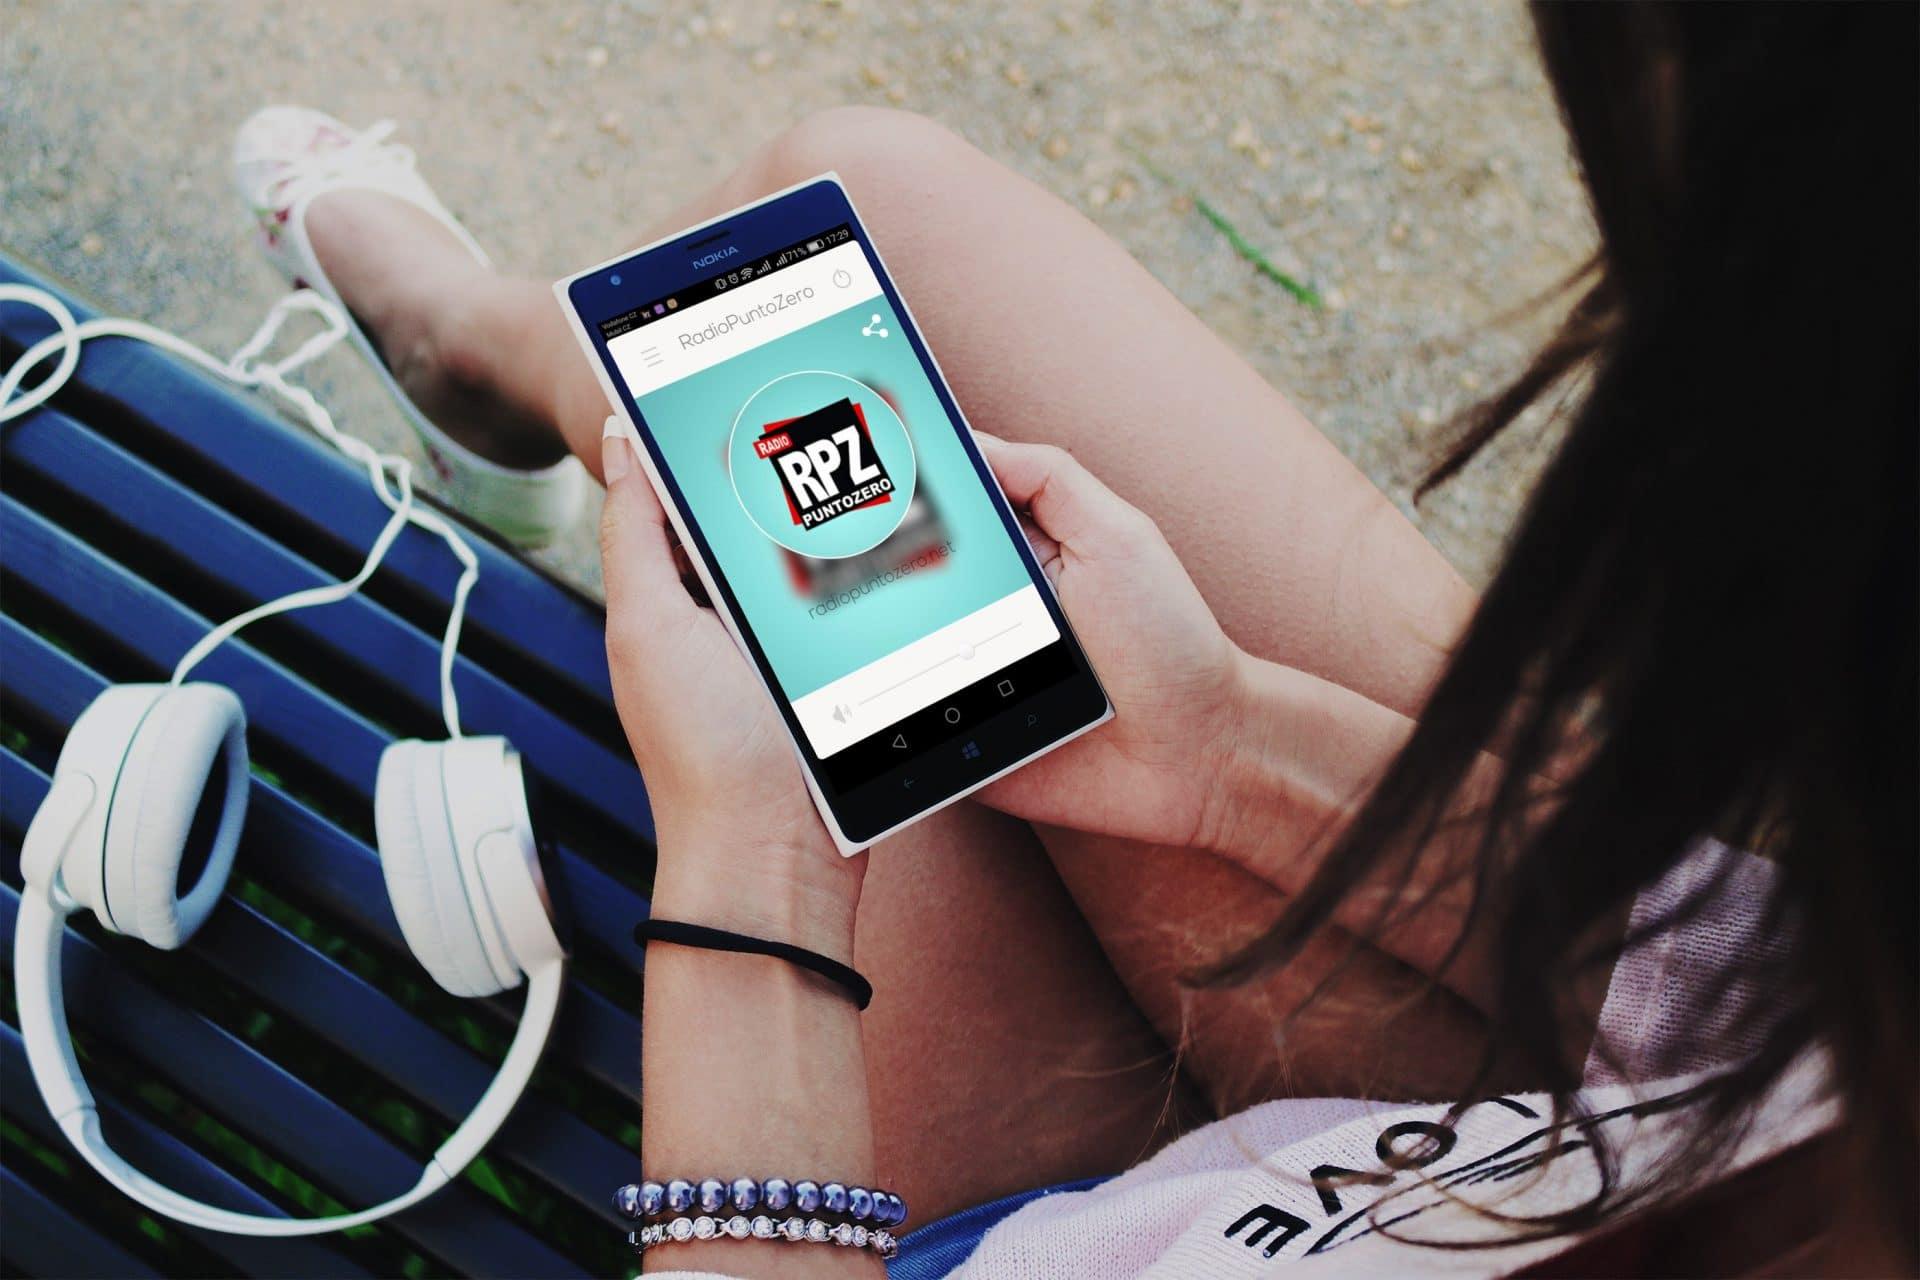 smartmockups_j6yxhr92-1 Le nostre Apps